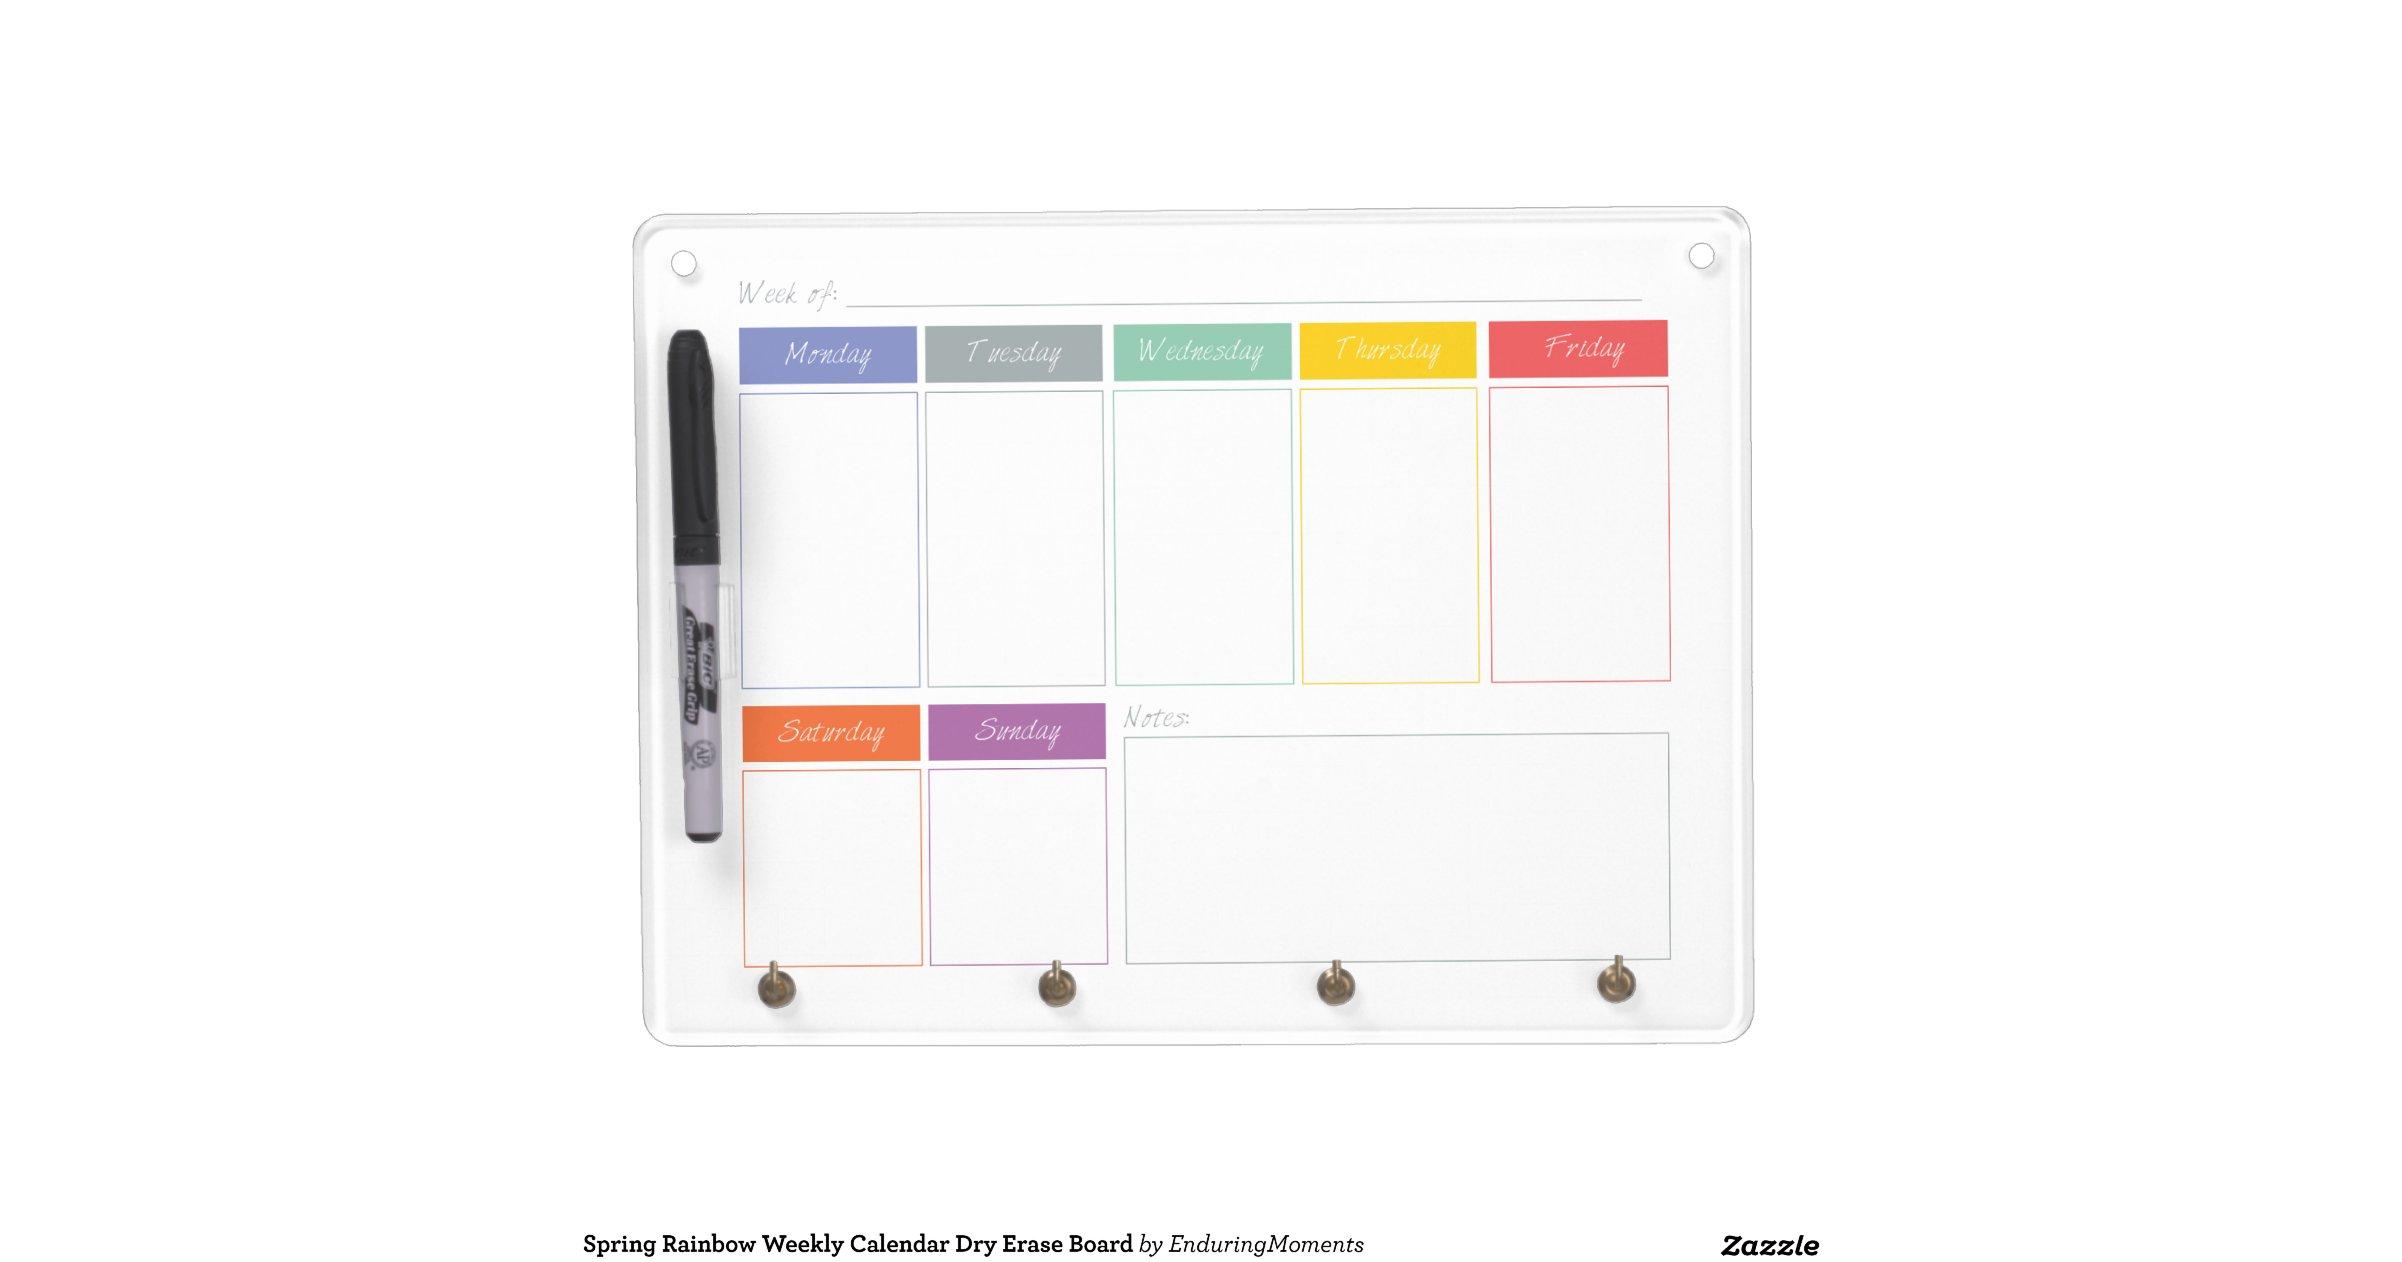 Dry Erase Weekly Calendar Board : Spring rainbow weekly calendar dry erase board